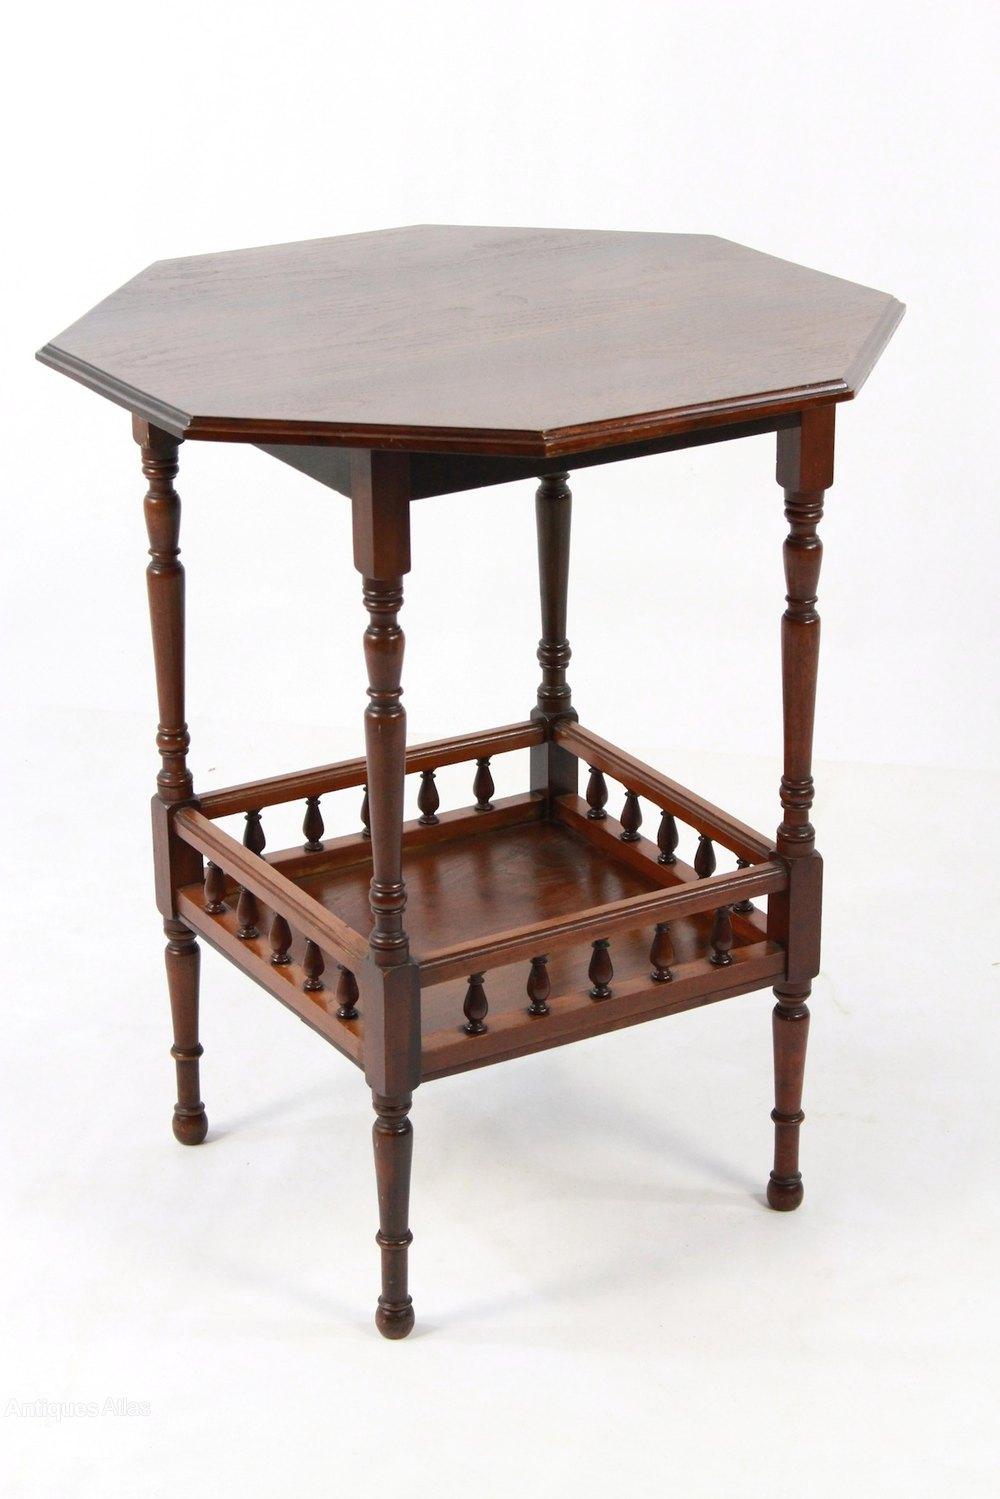 Antique Edwardian Walnut Octagonal Side Hall Table